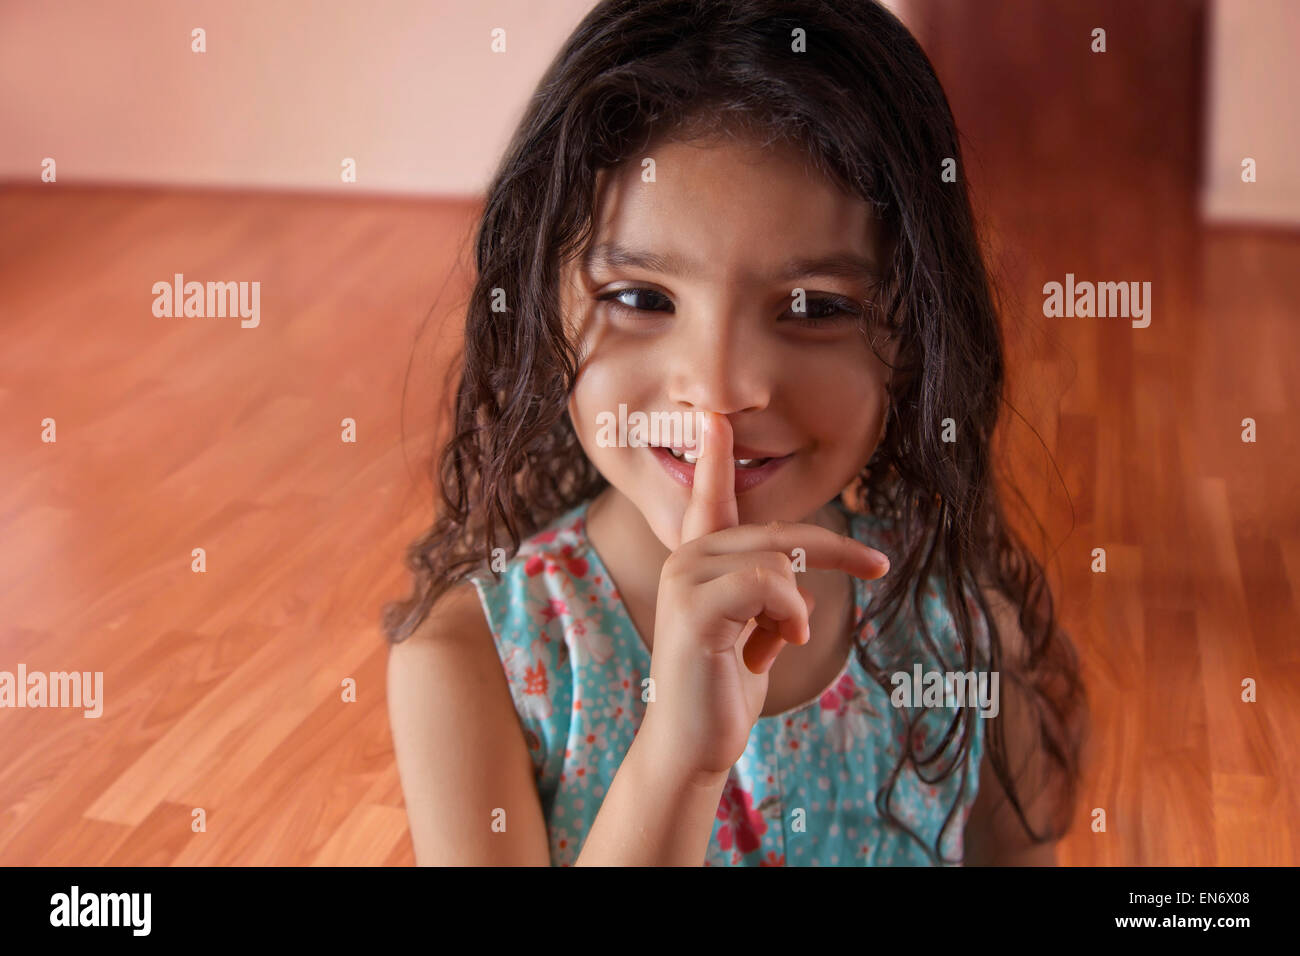 Little girl with finger on lips - Stock Image